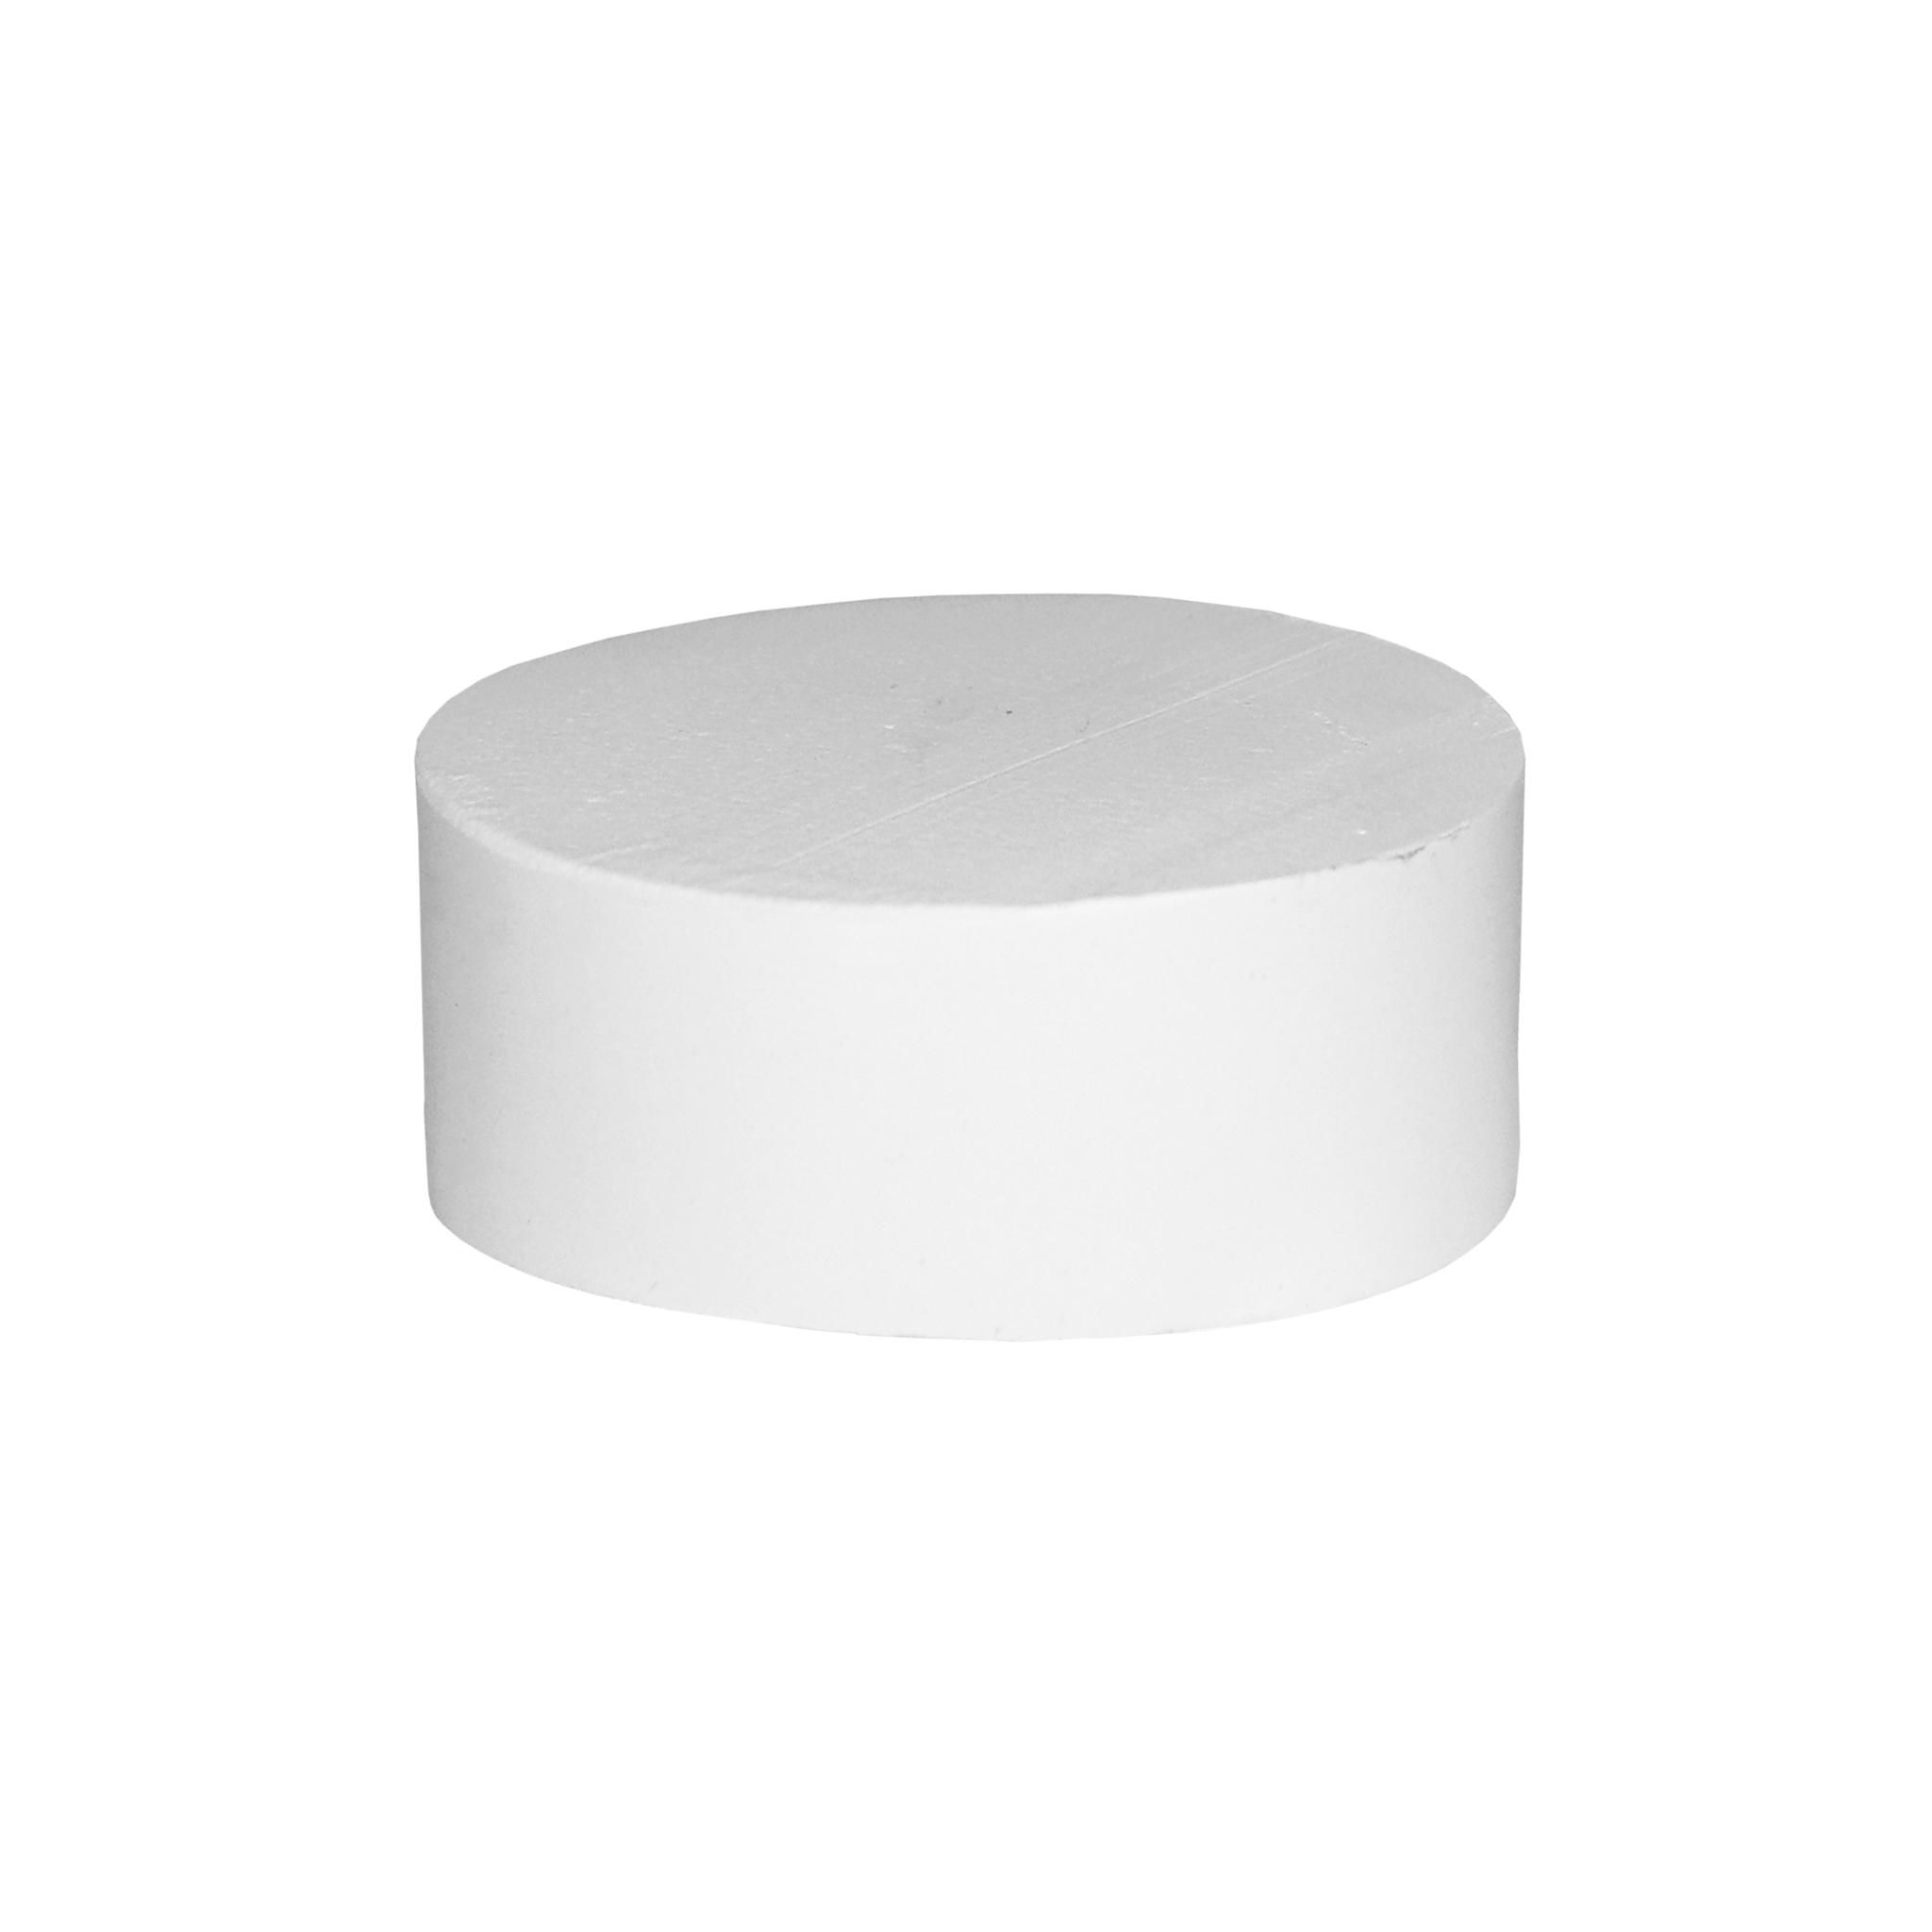 HRANITHERM 1000.31 Blanc - EVA Thermofusible